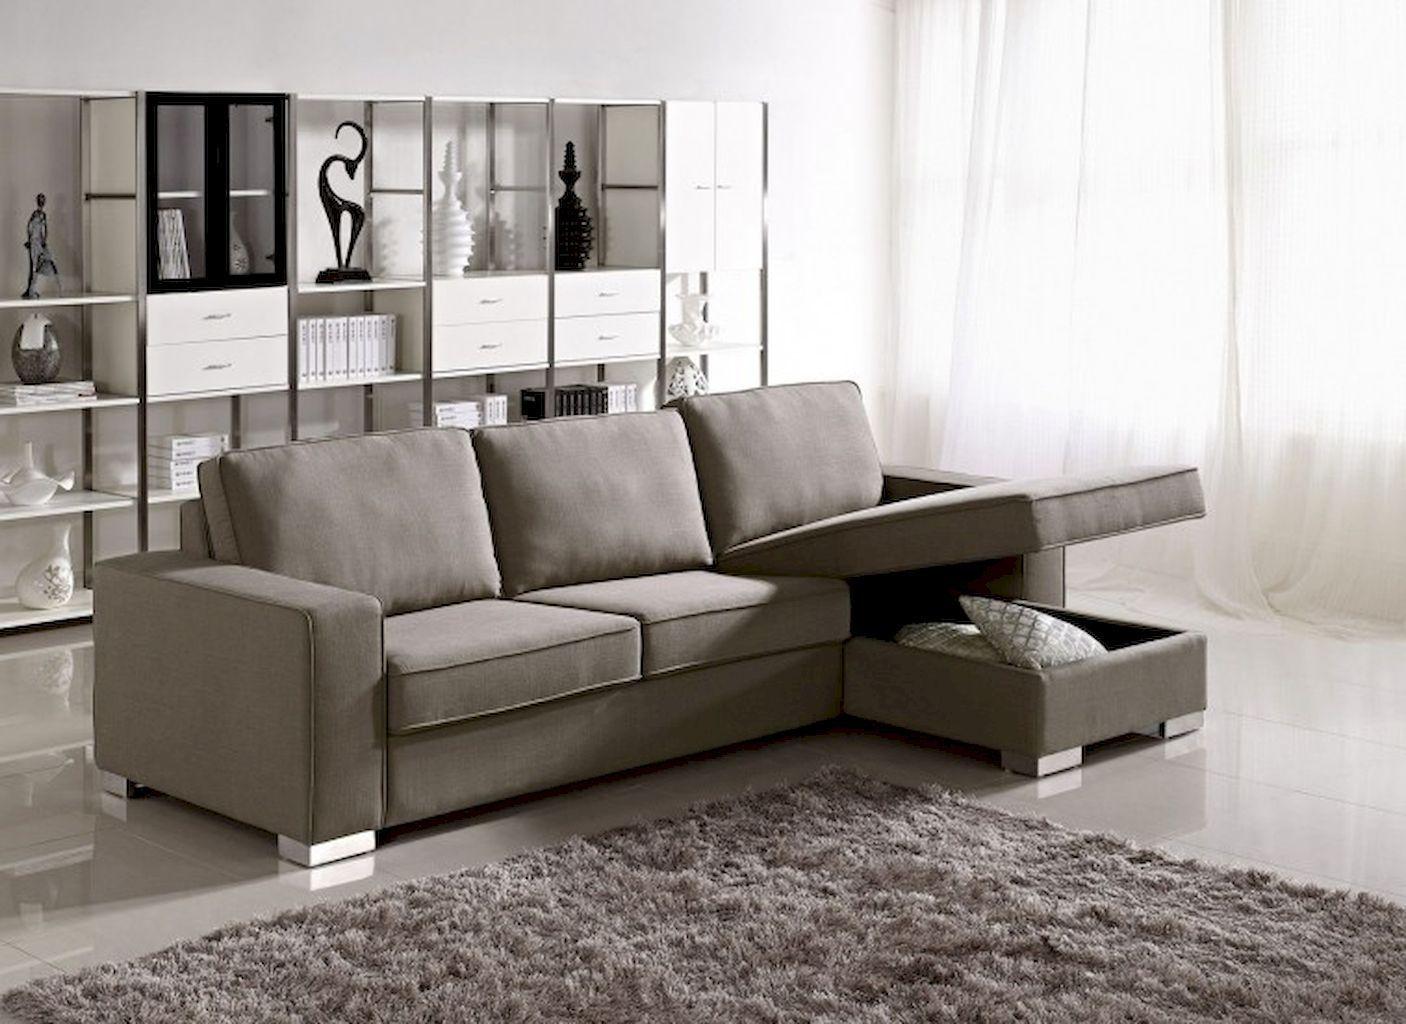 Admirable 50 Simple Small Apartment Size Recliners Ideas On A Budget Creativecarmelina Interior Chair Design Creativecarmelinacom